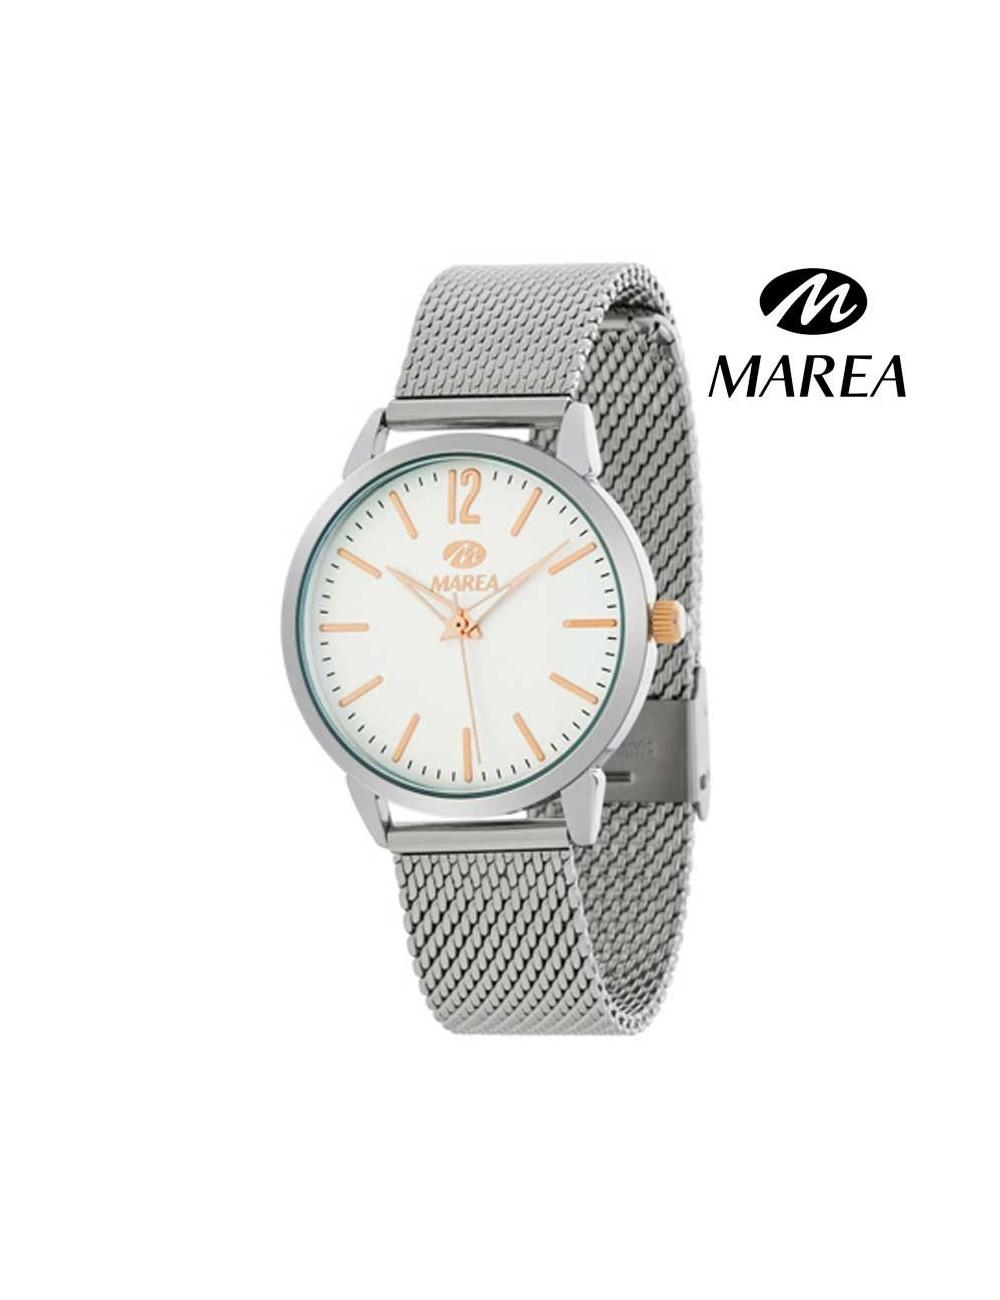 reloj-marea-mujer-cadena-malla-b41173-3-esfera-blanca